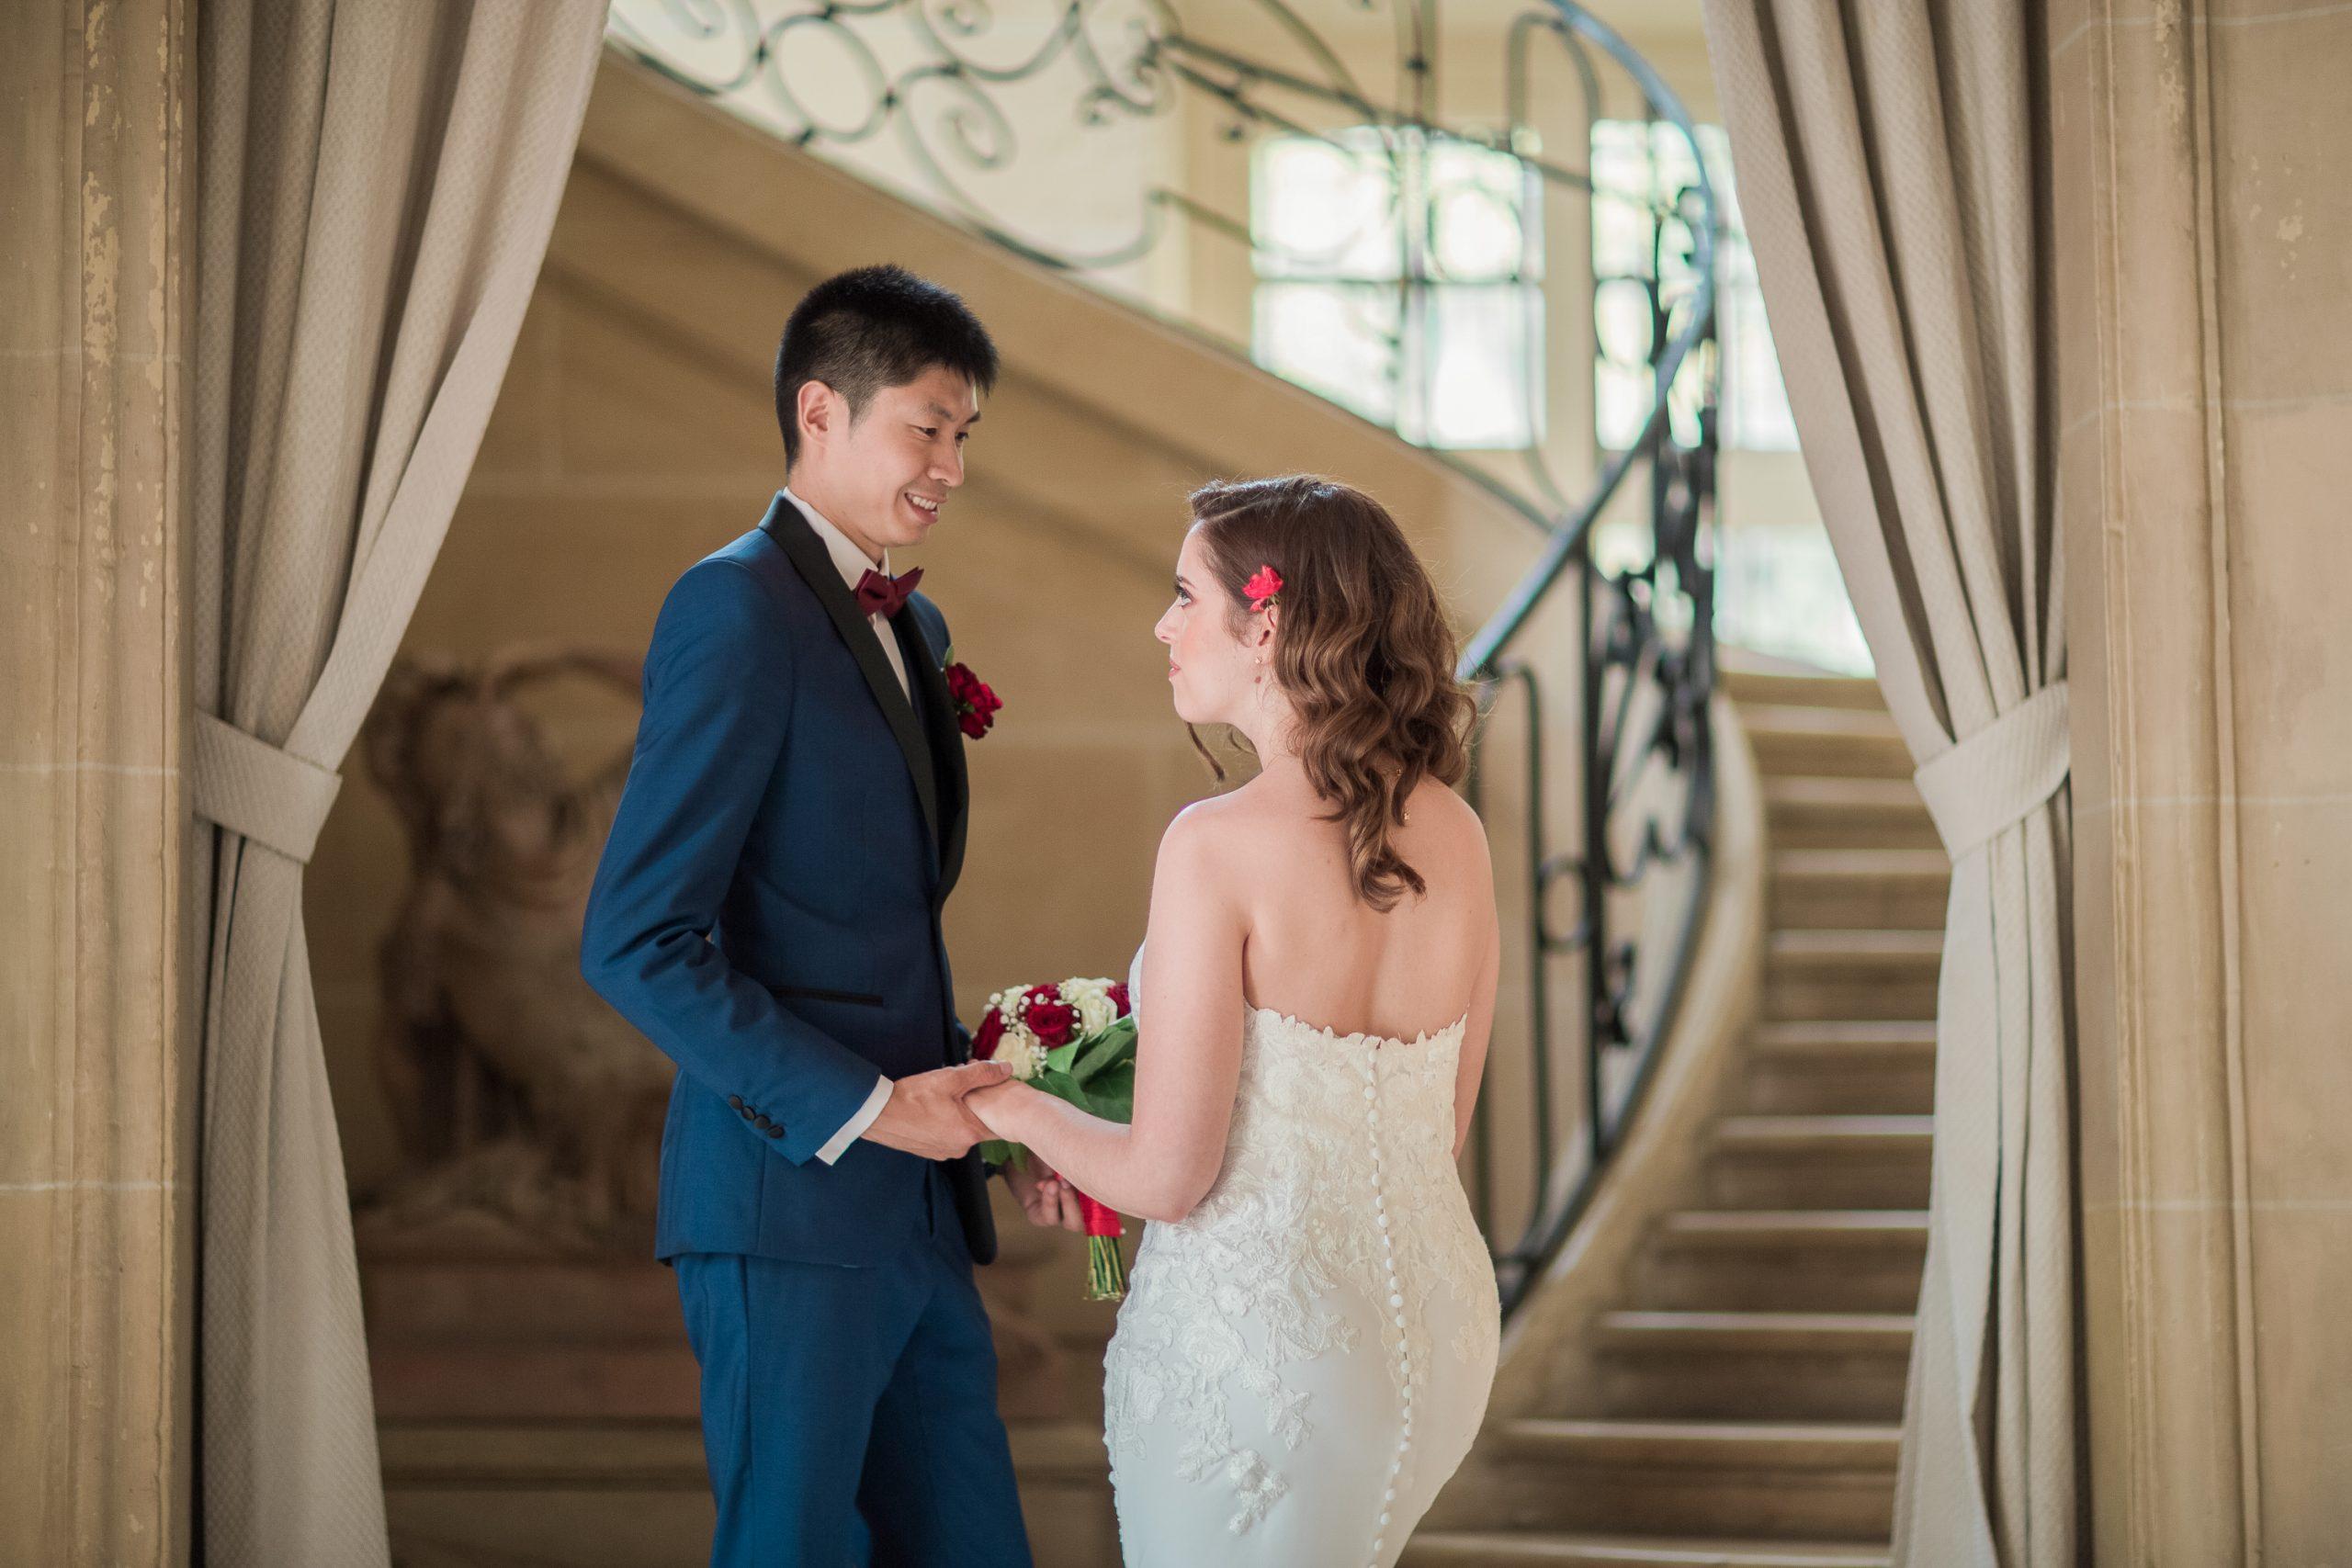 photographe-mariage-couple-chateau-nandy-77